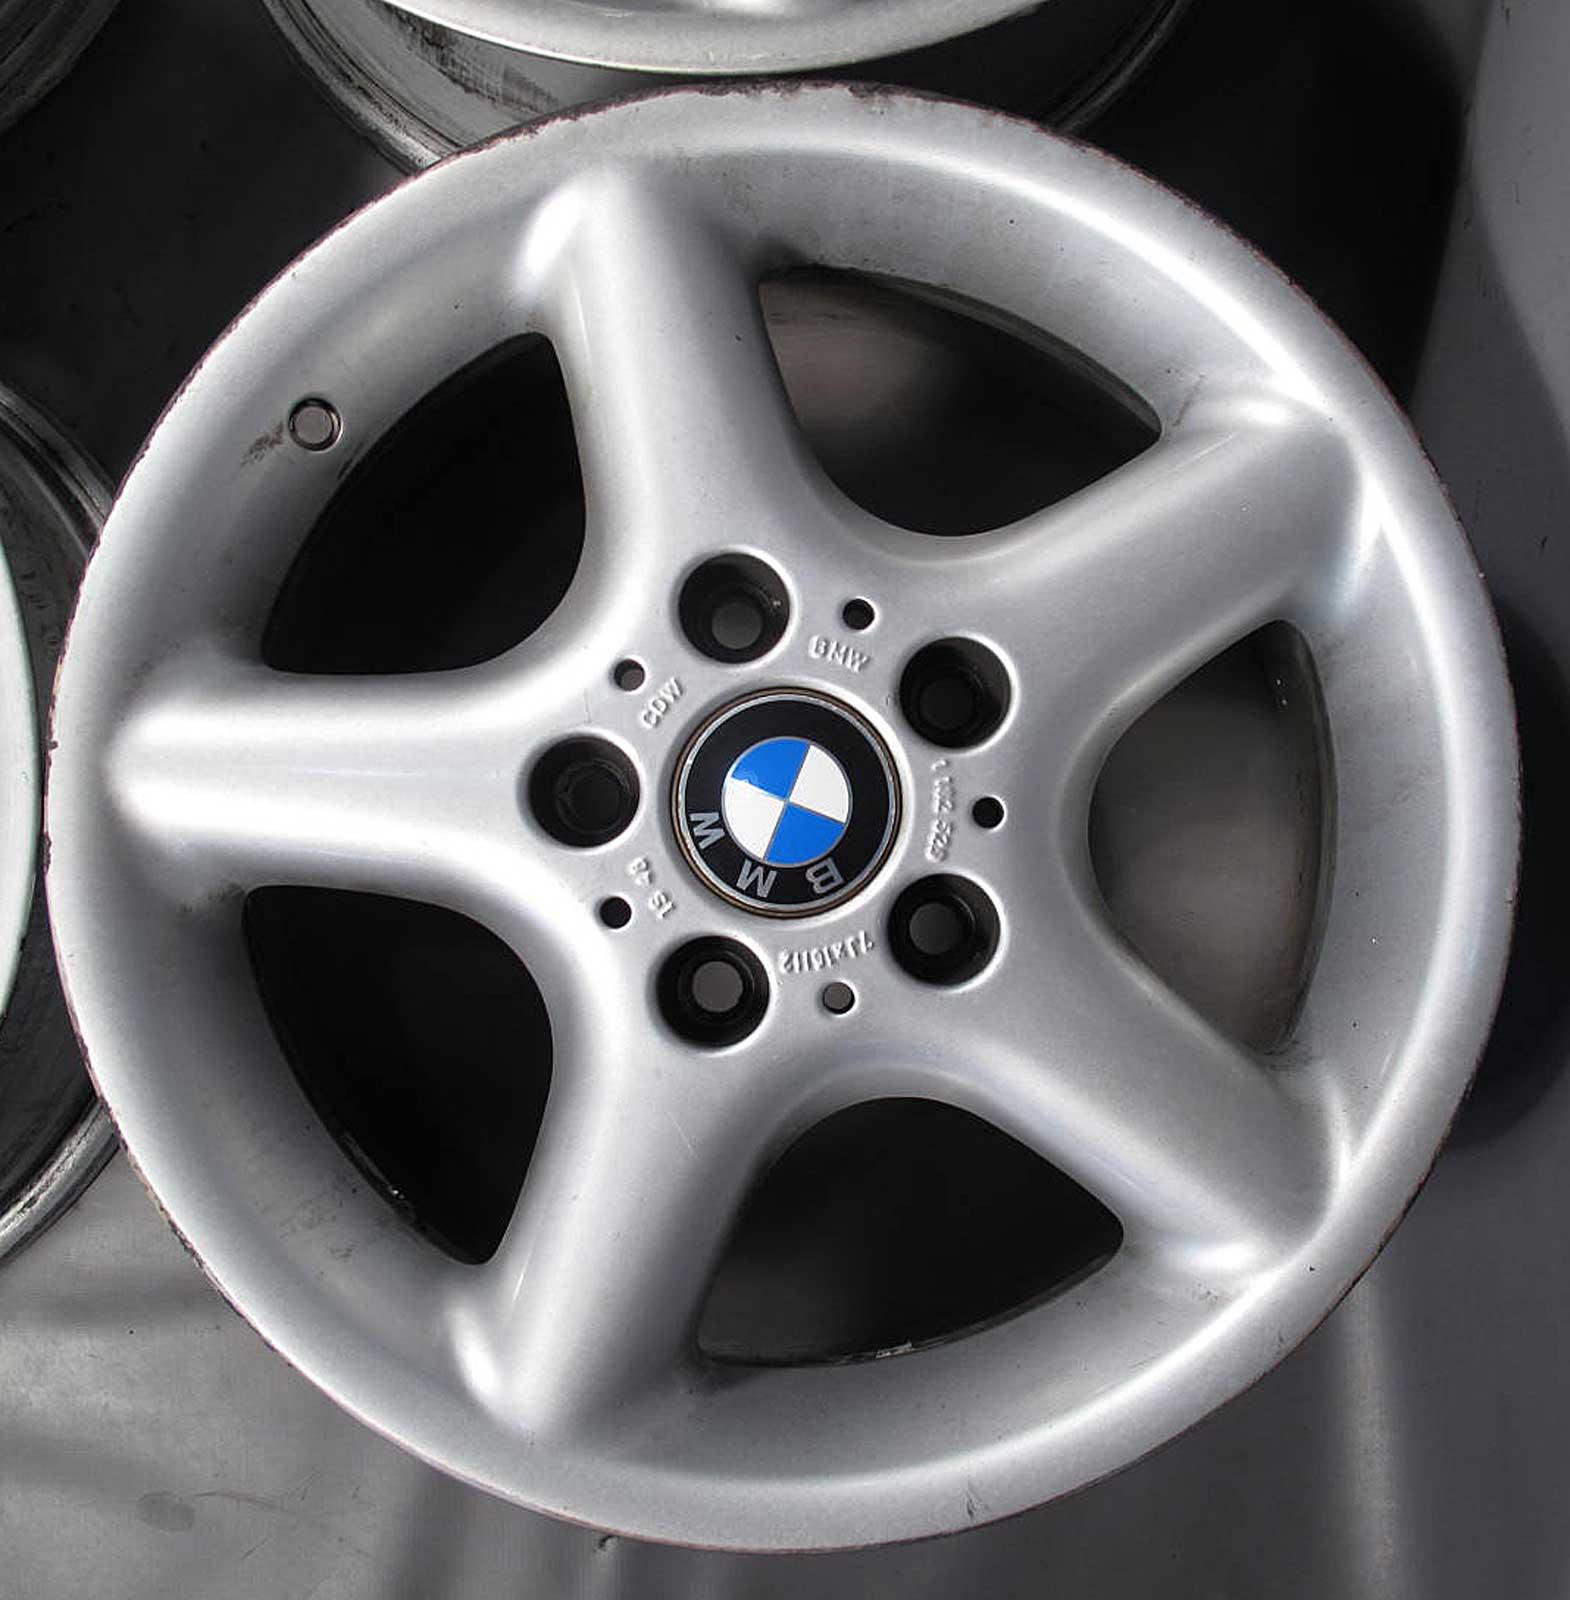 itm set factory styles wheel inv oem bmw spoke of rim style